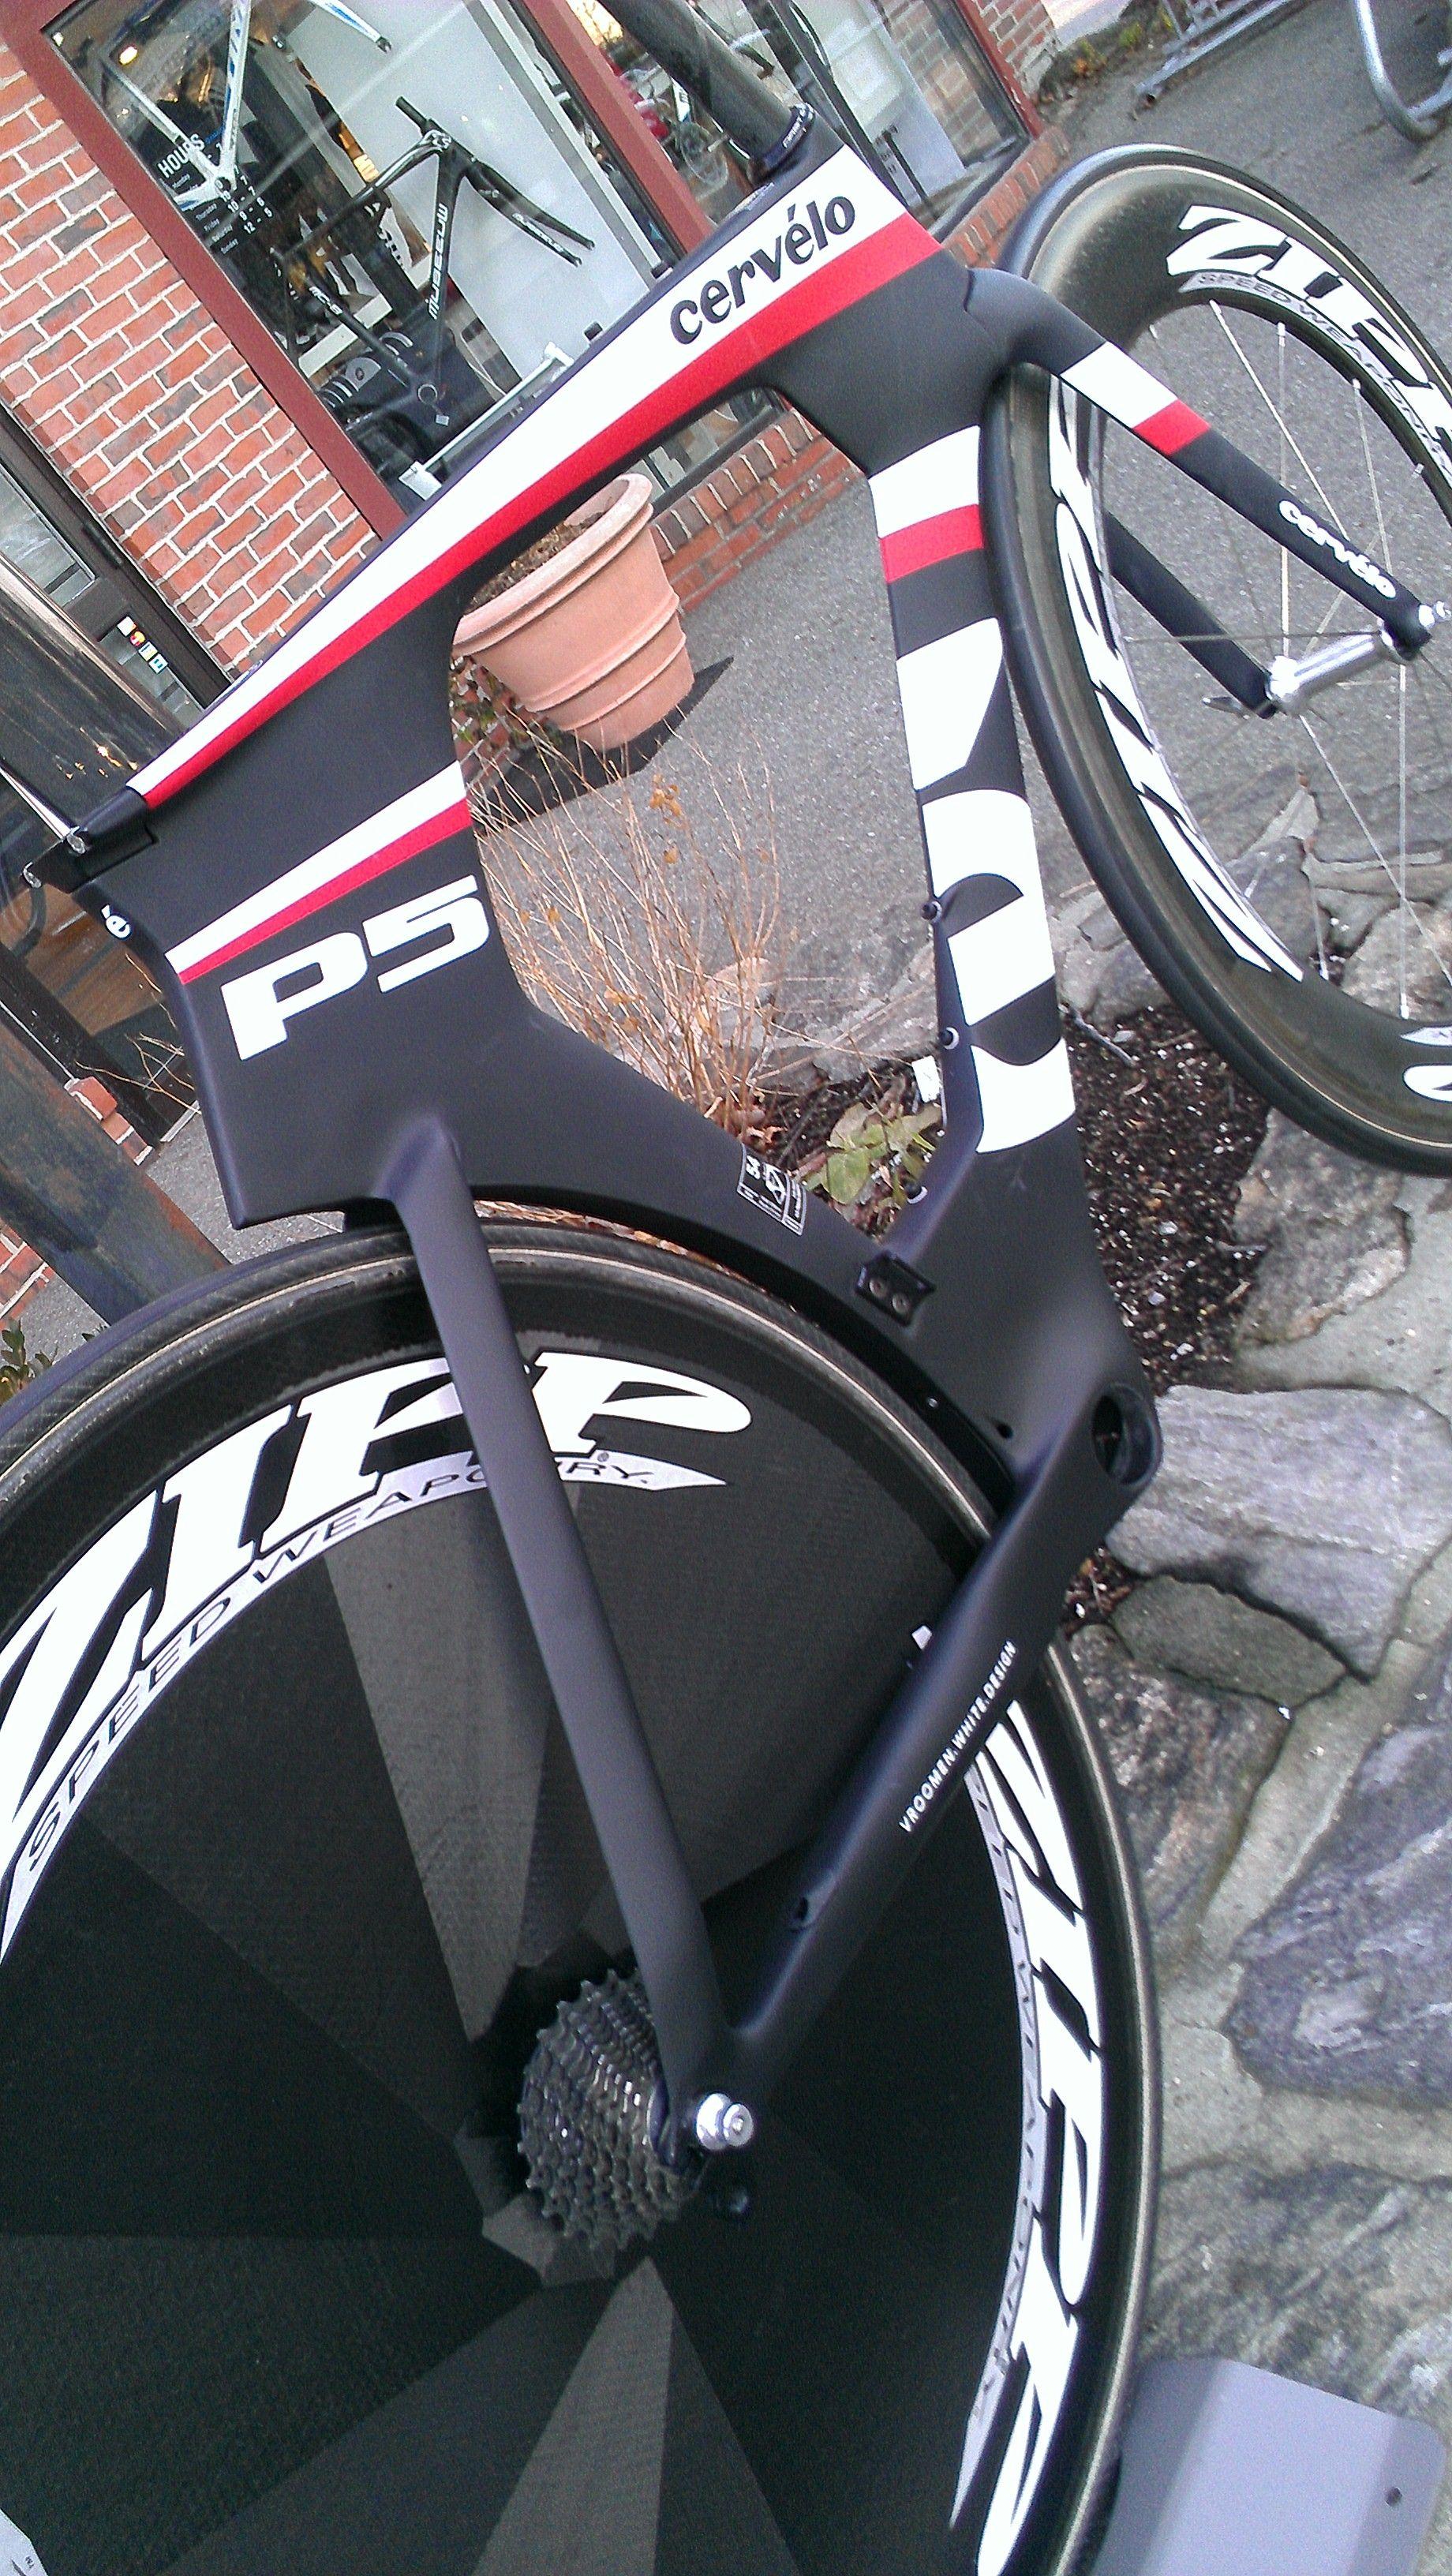 Cervelo P5 with Zipp wheels Bicicleta de estrada, Bicicleta